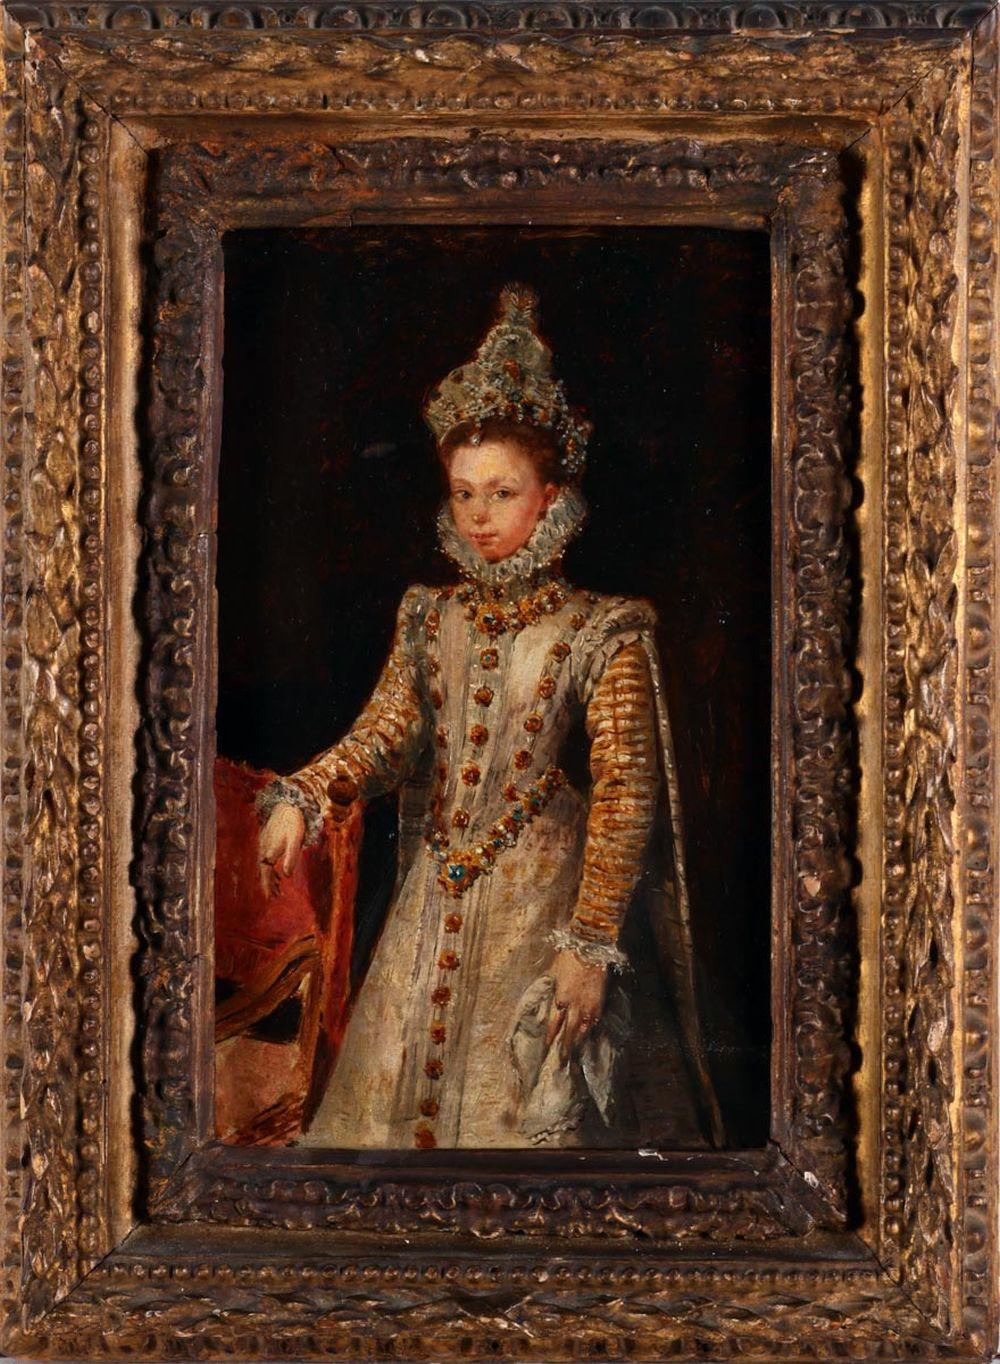 INFANTA CLARA EUGENIA OF SPAIN (1566-1633)